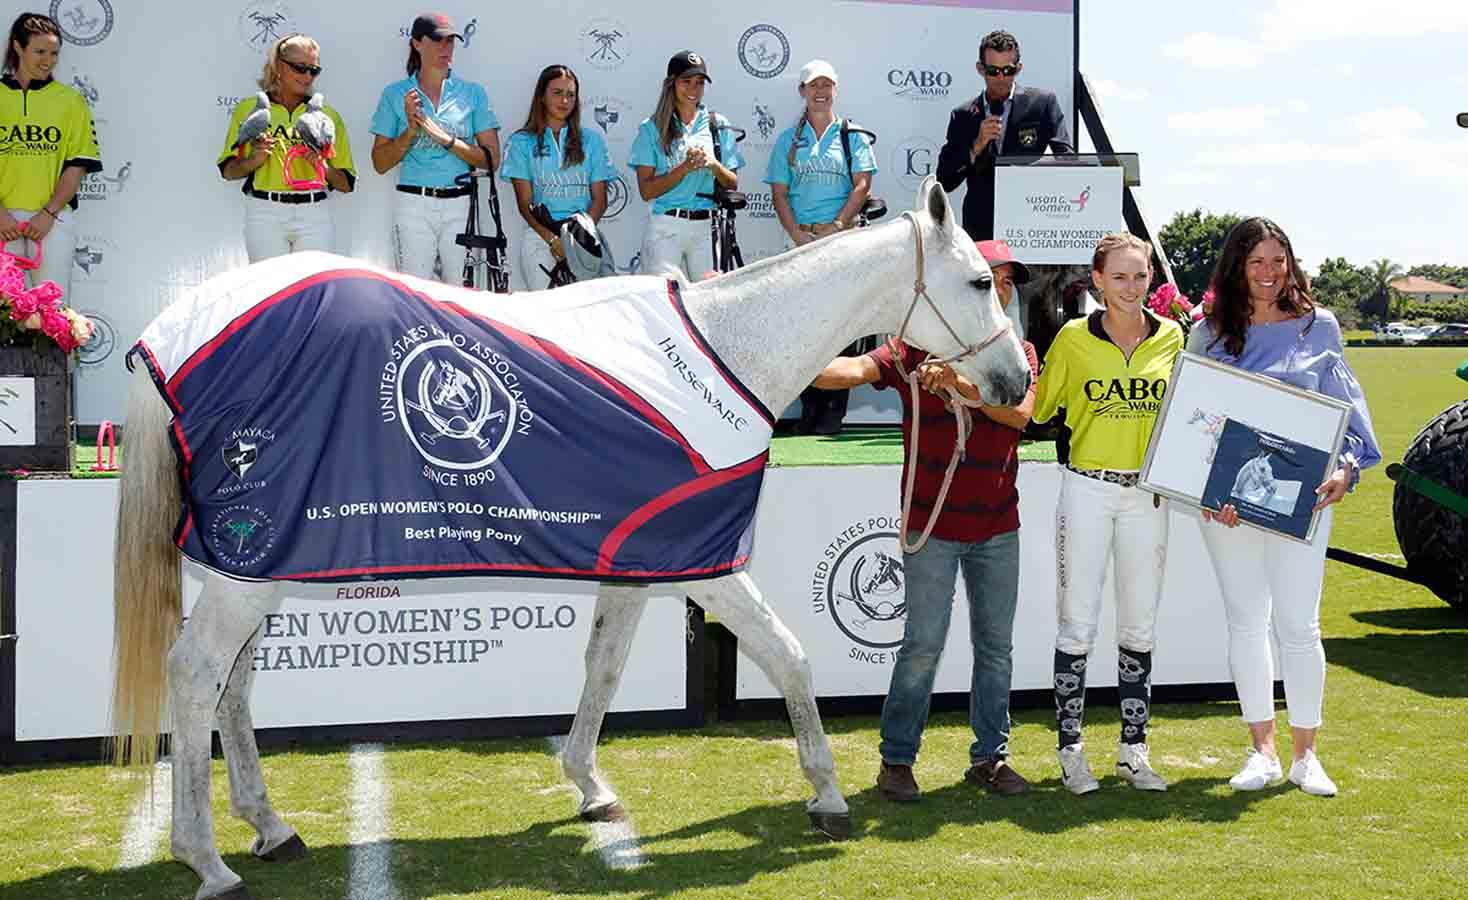 U.S. Open Women's Polo Championship